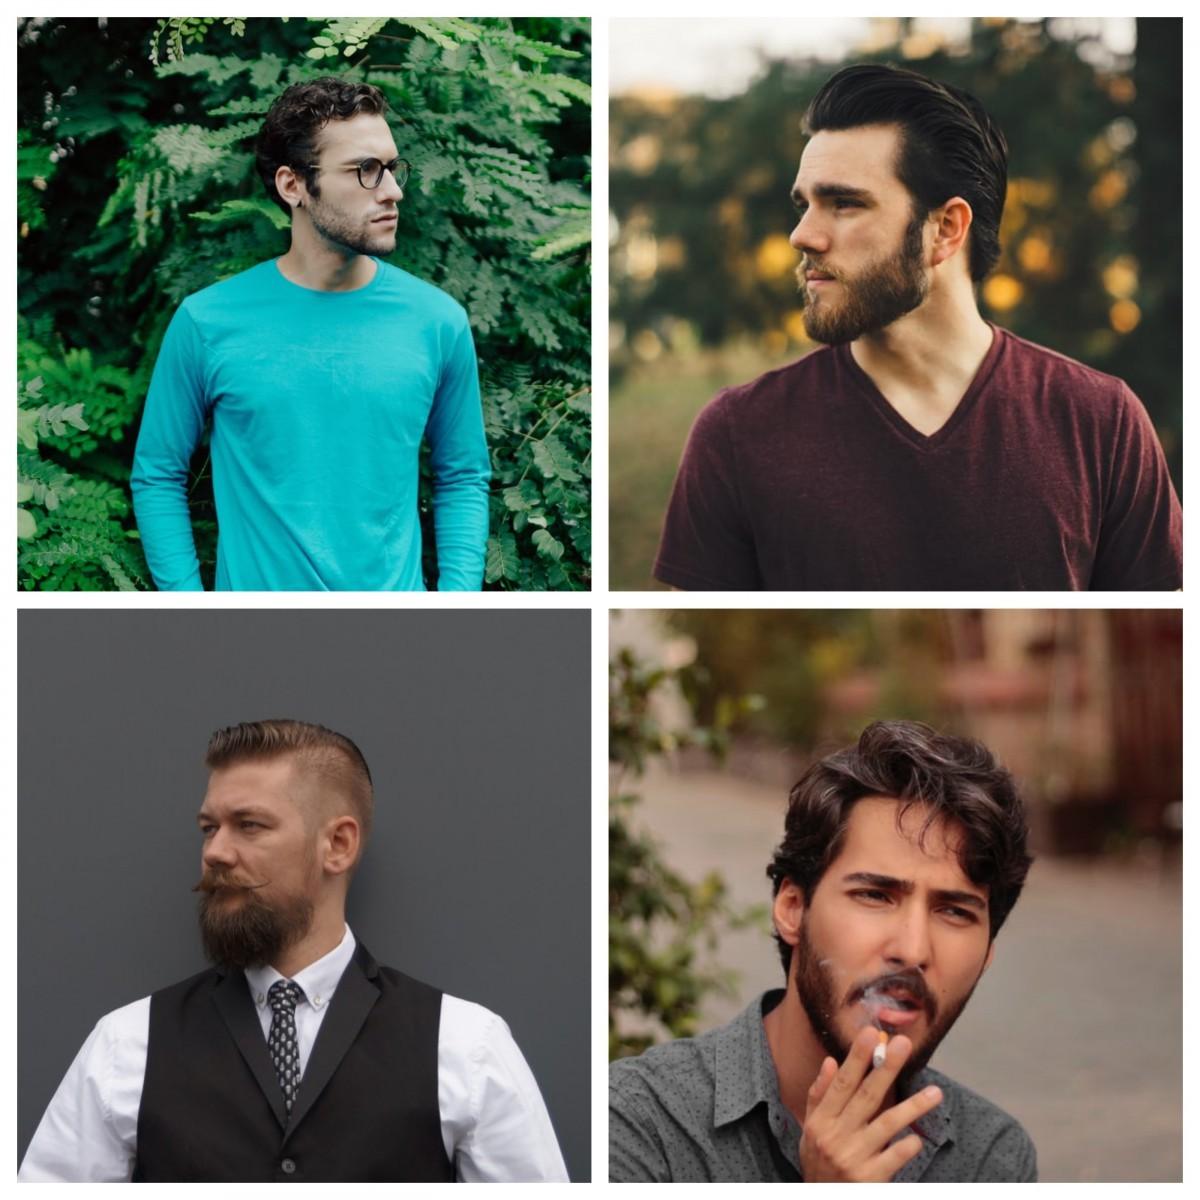 kapsel trends mannen 2018